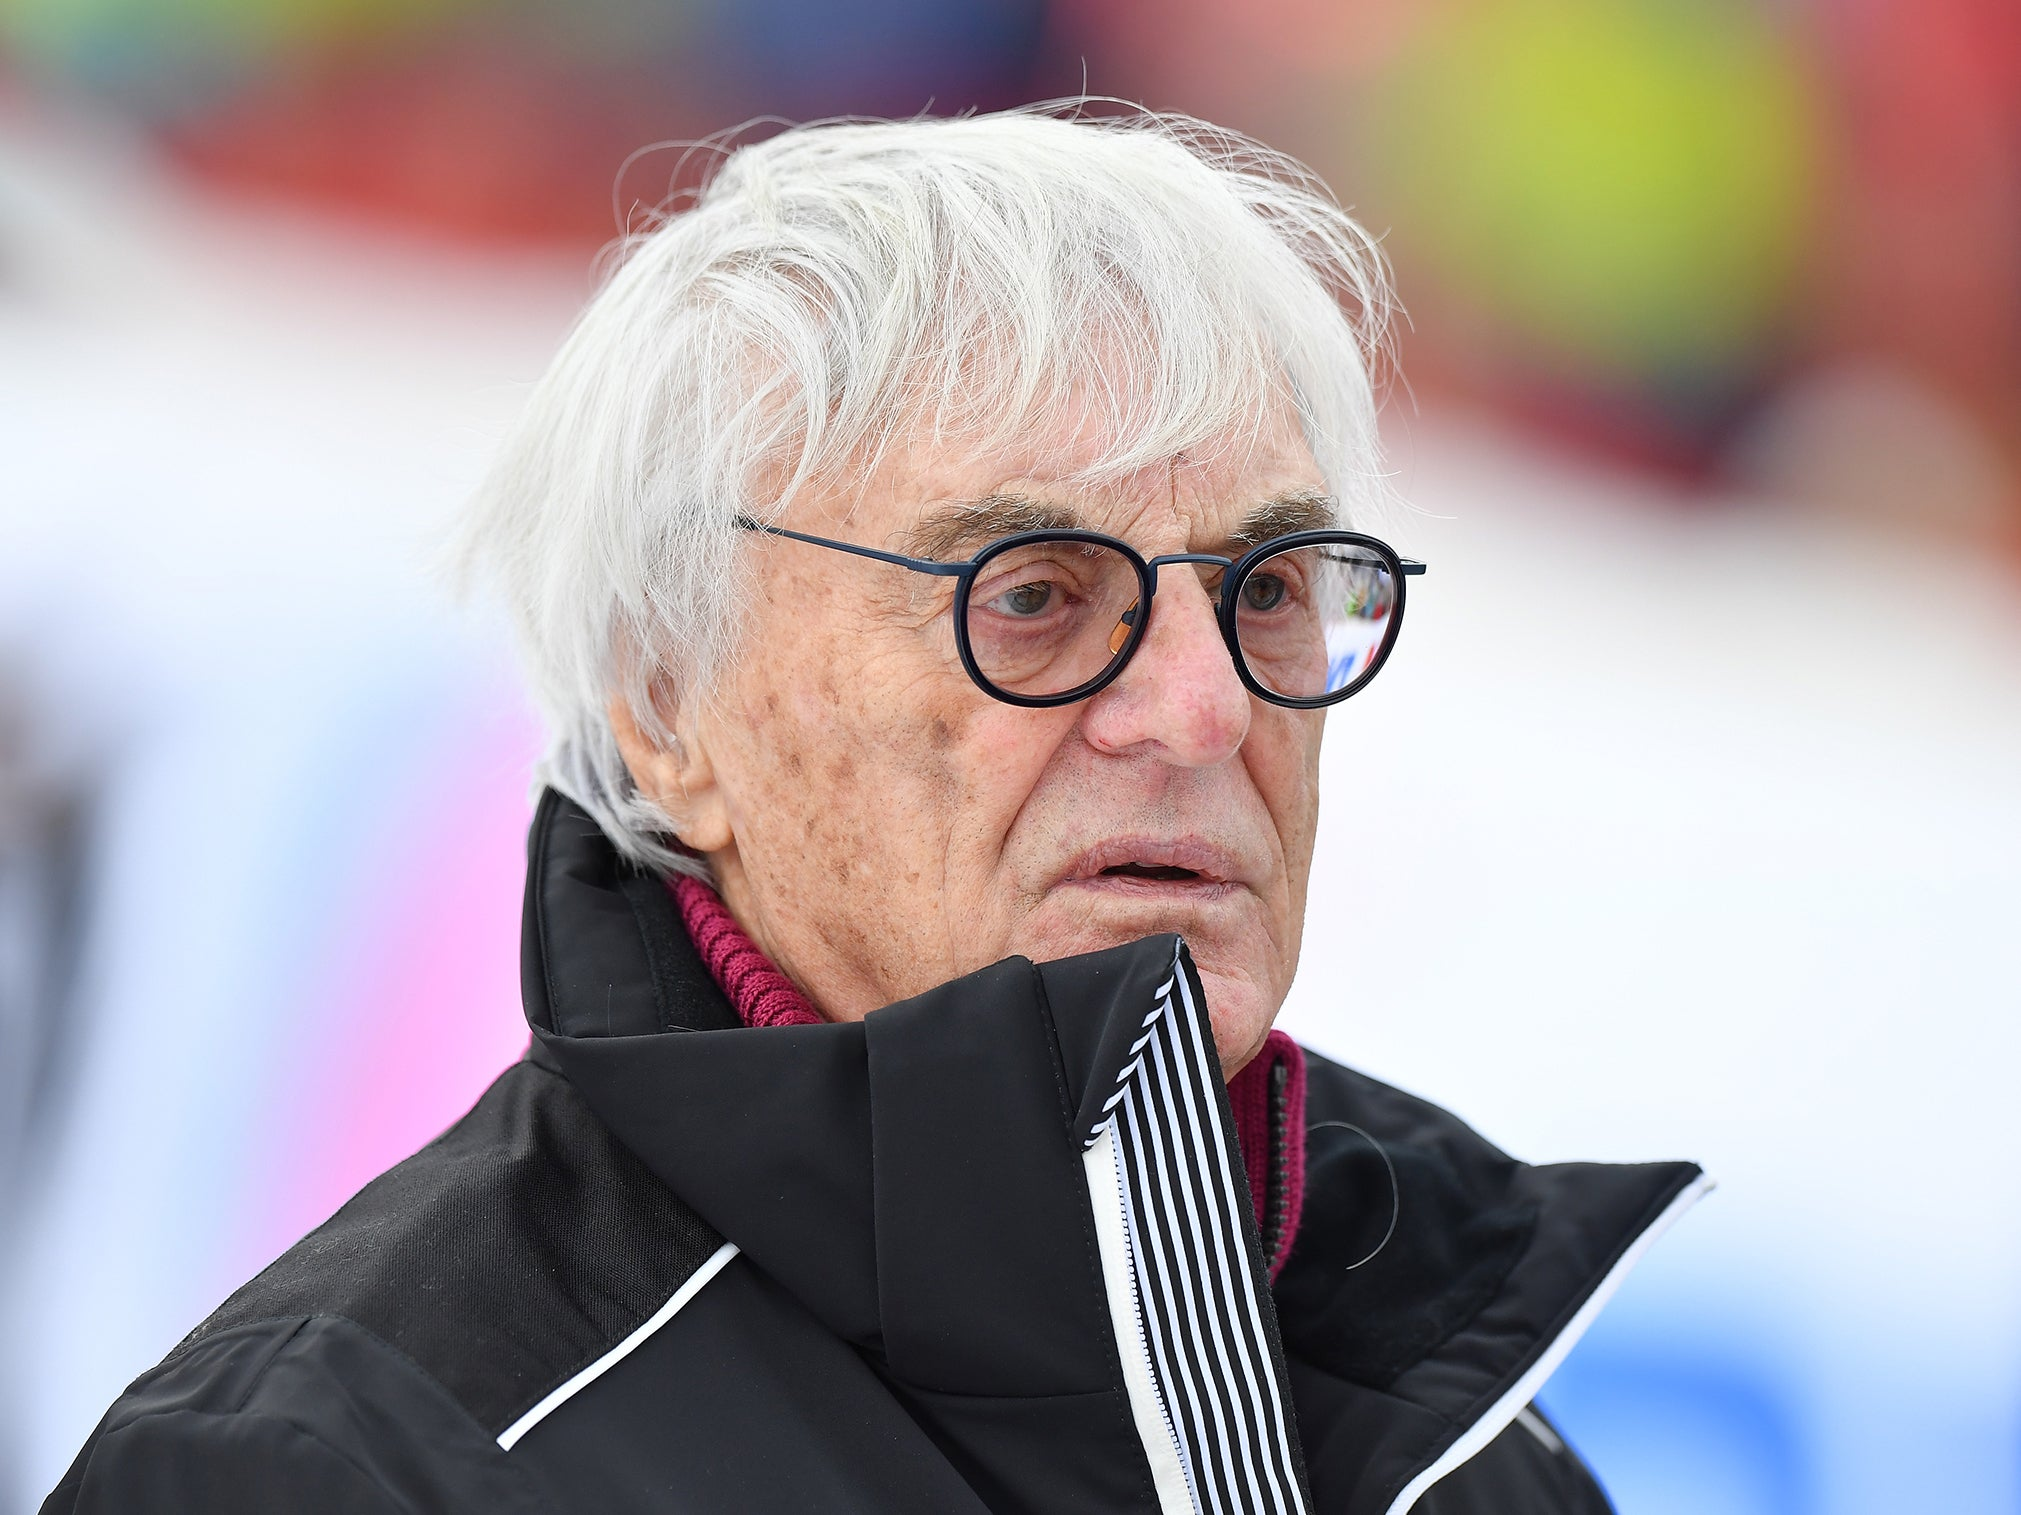 Coronavirus: Formula One owners will be forced to bankroll race promoters, warns Bernie Ecclestone